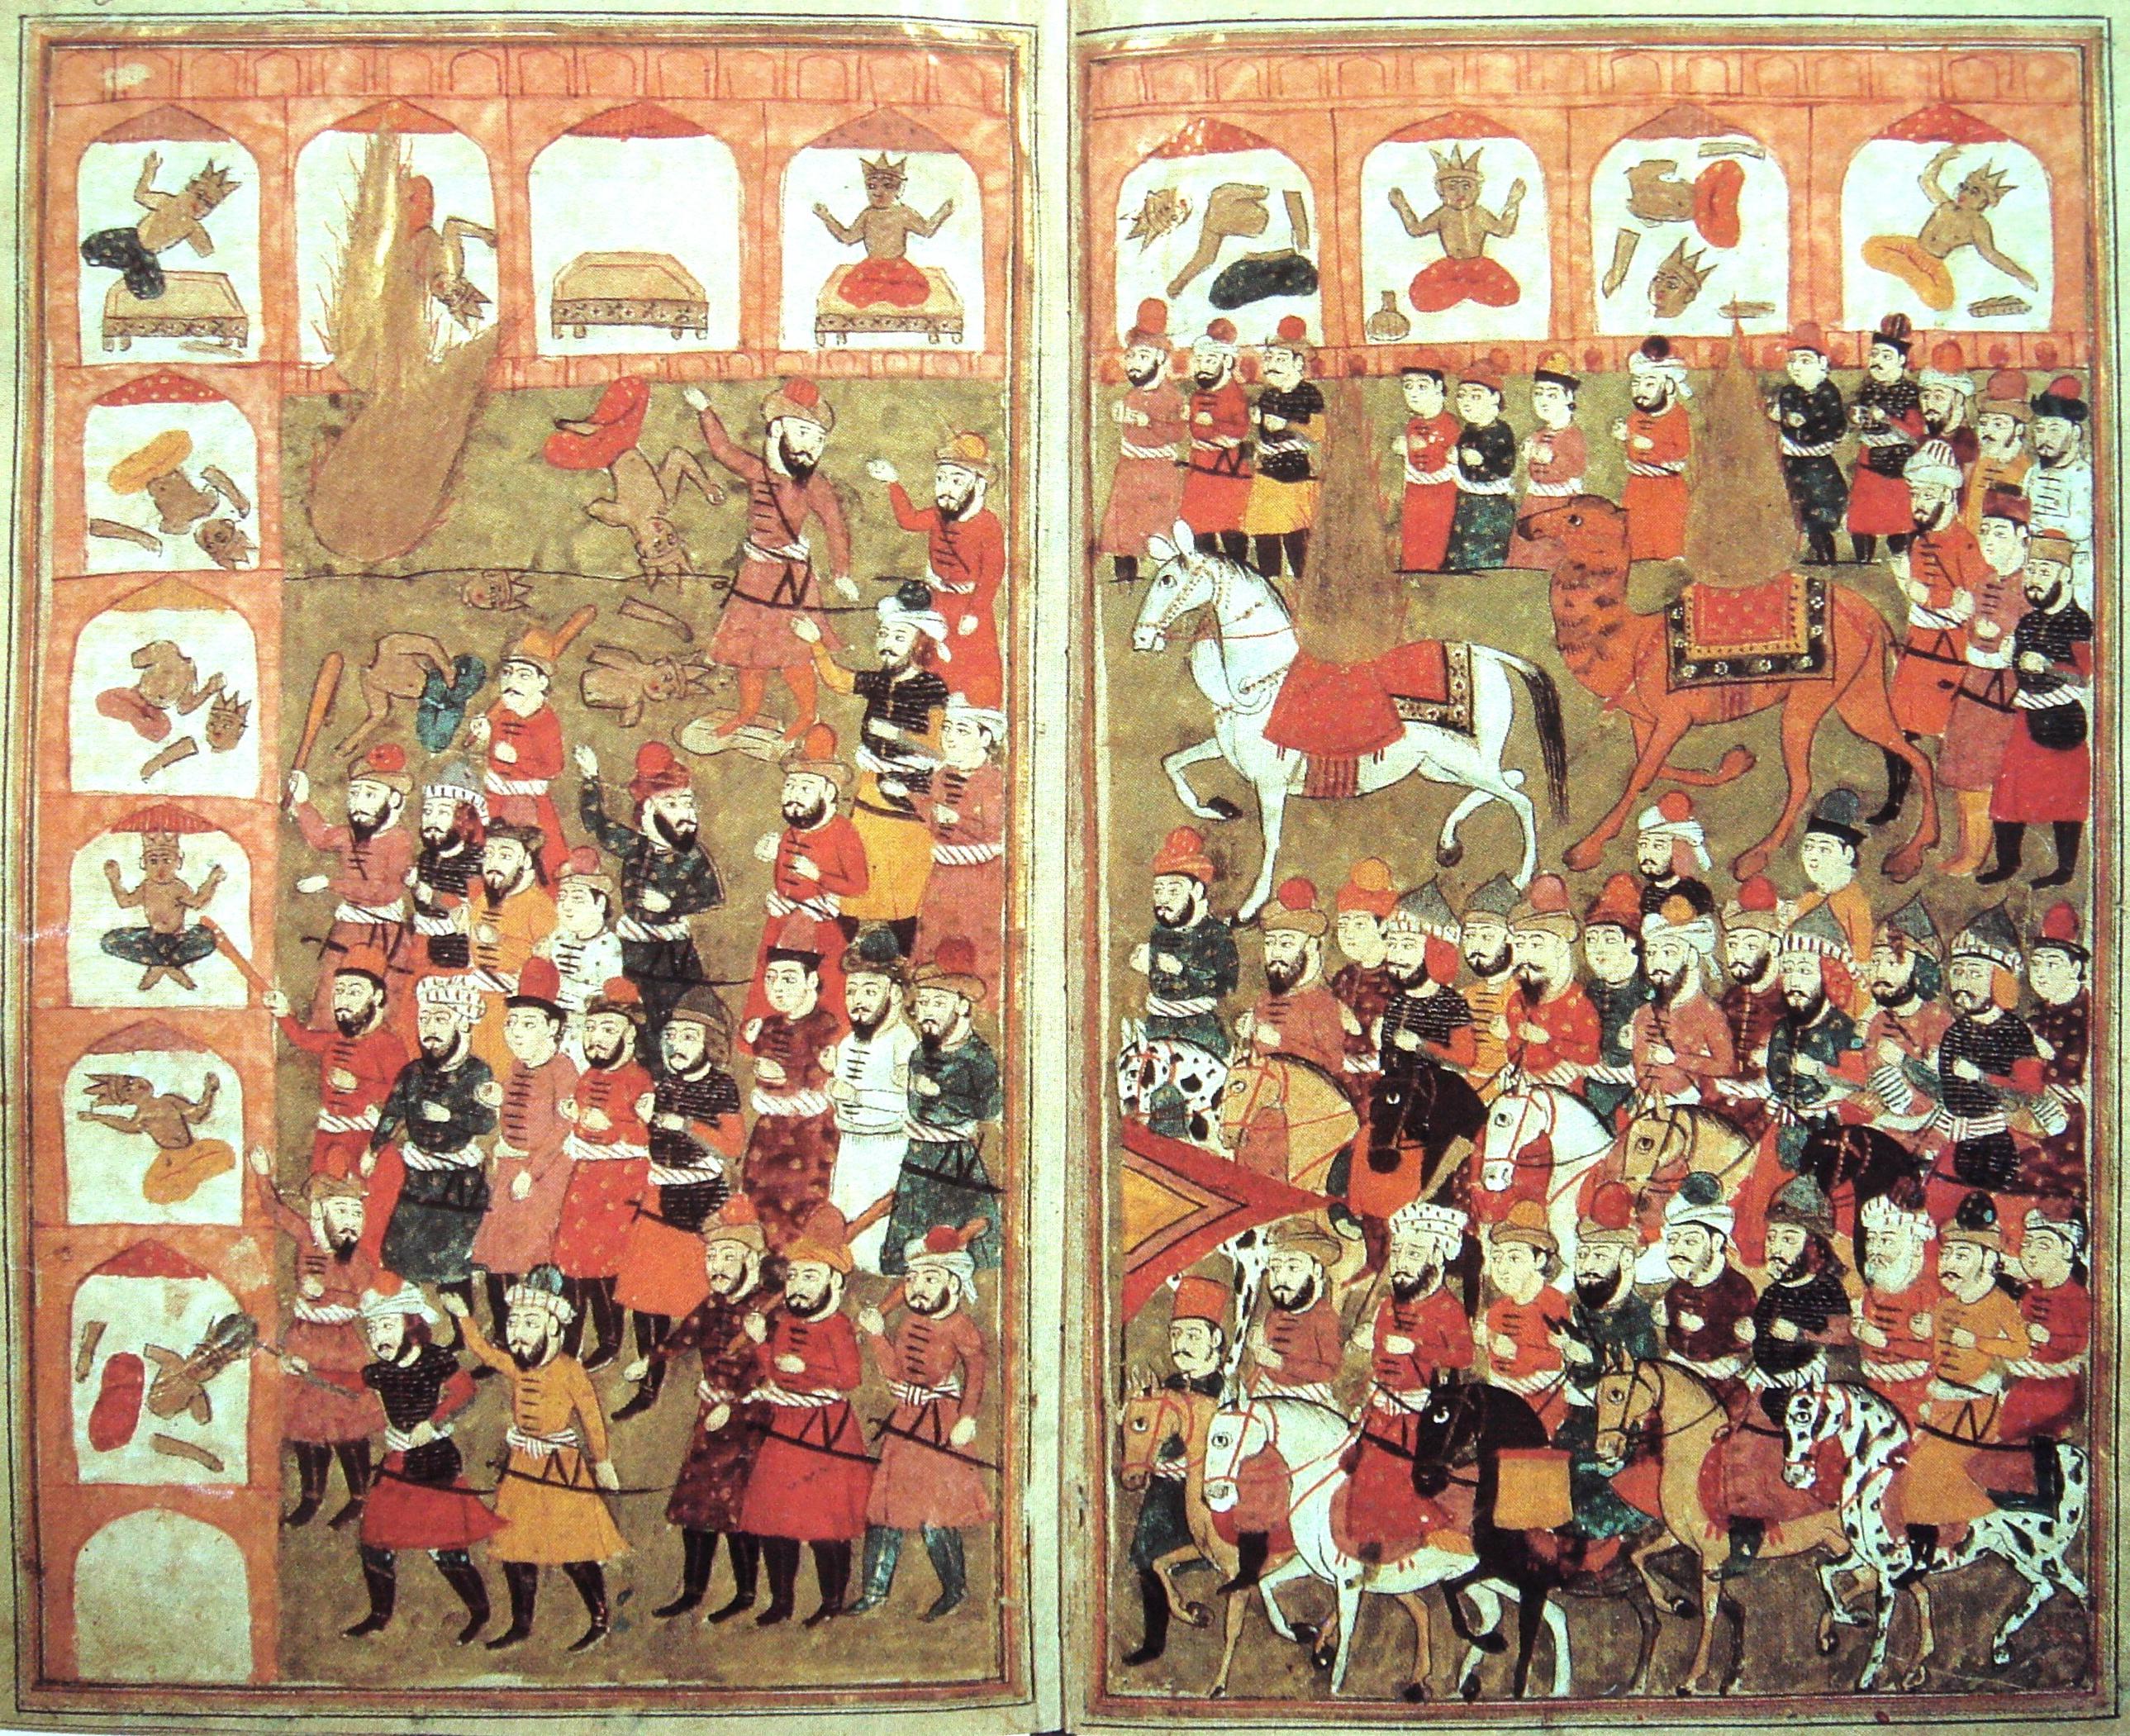 https://i2.wp.com/upload.wikimedia.org/wikipedia/commons/c/ca/Muhammad_destroying_idols_-_L%27Histoire_Merveilleuse_en_Vers_de_Mahomet_BNF.jpg